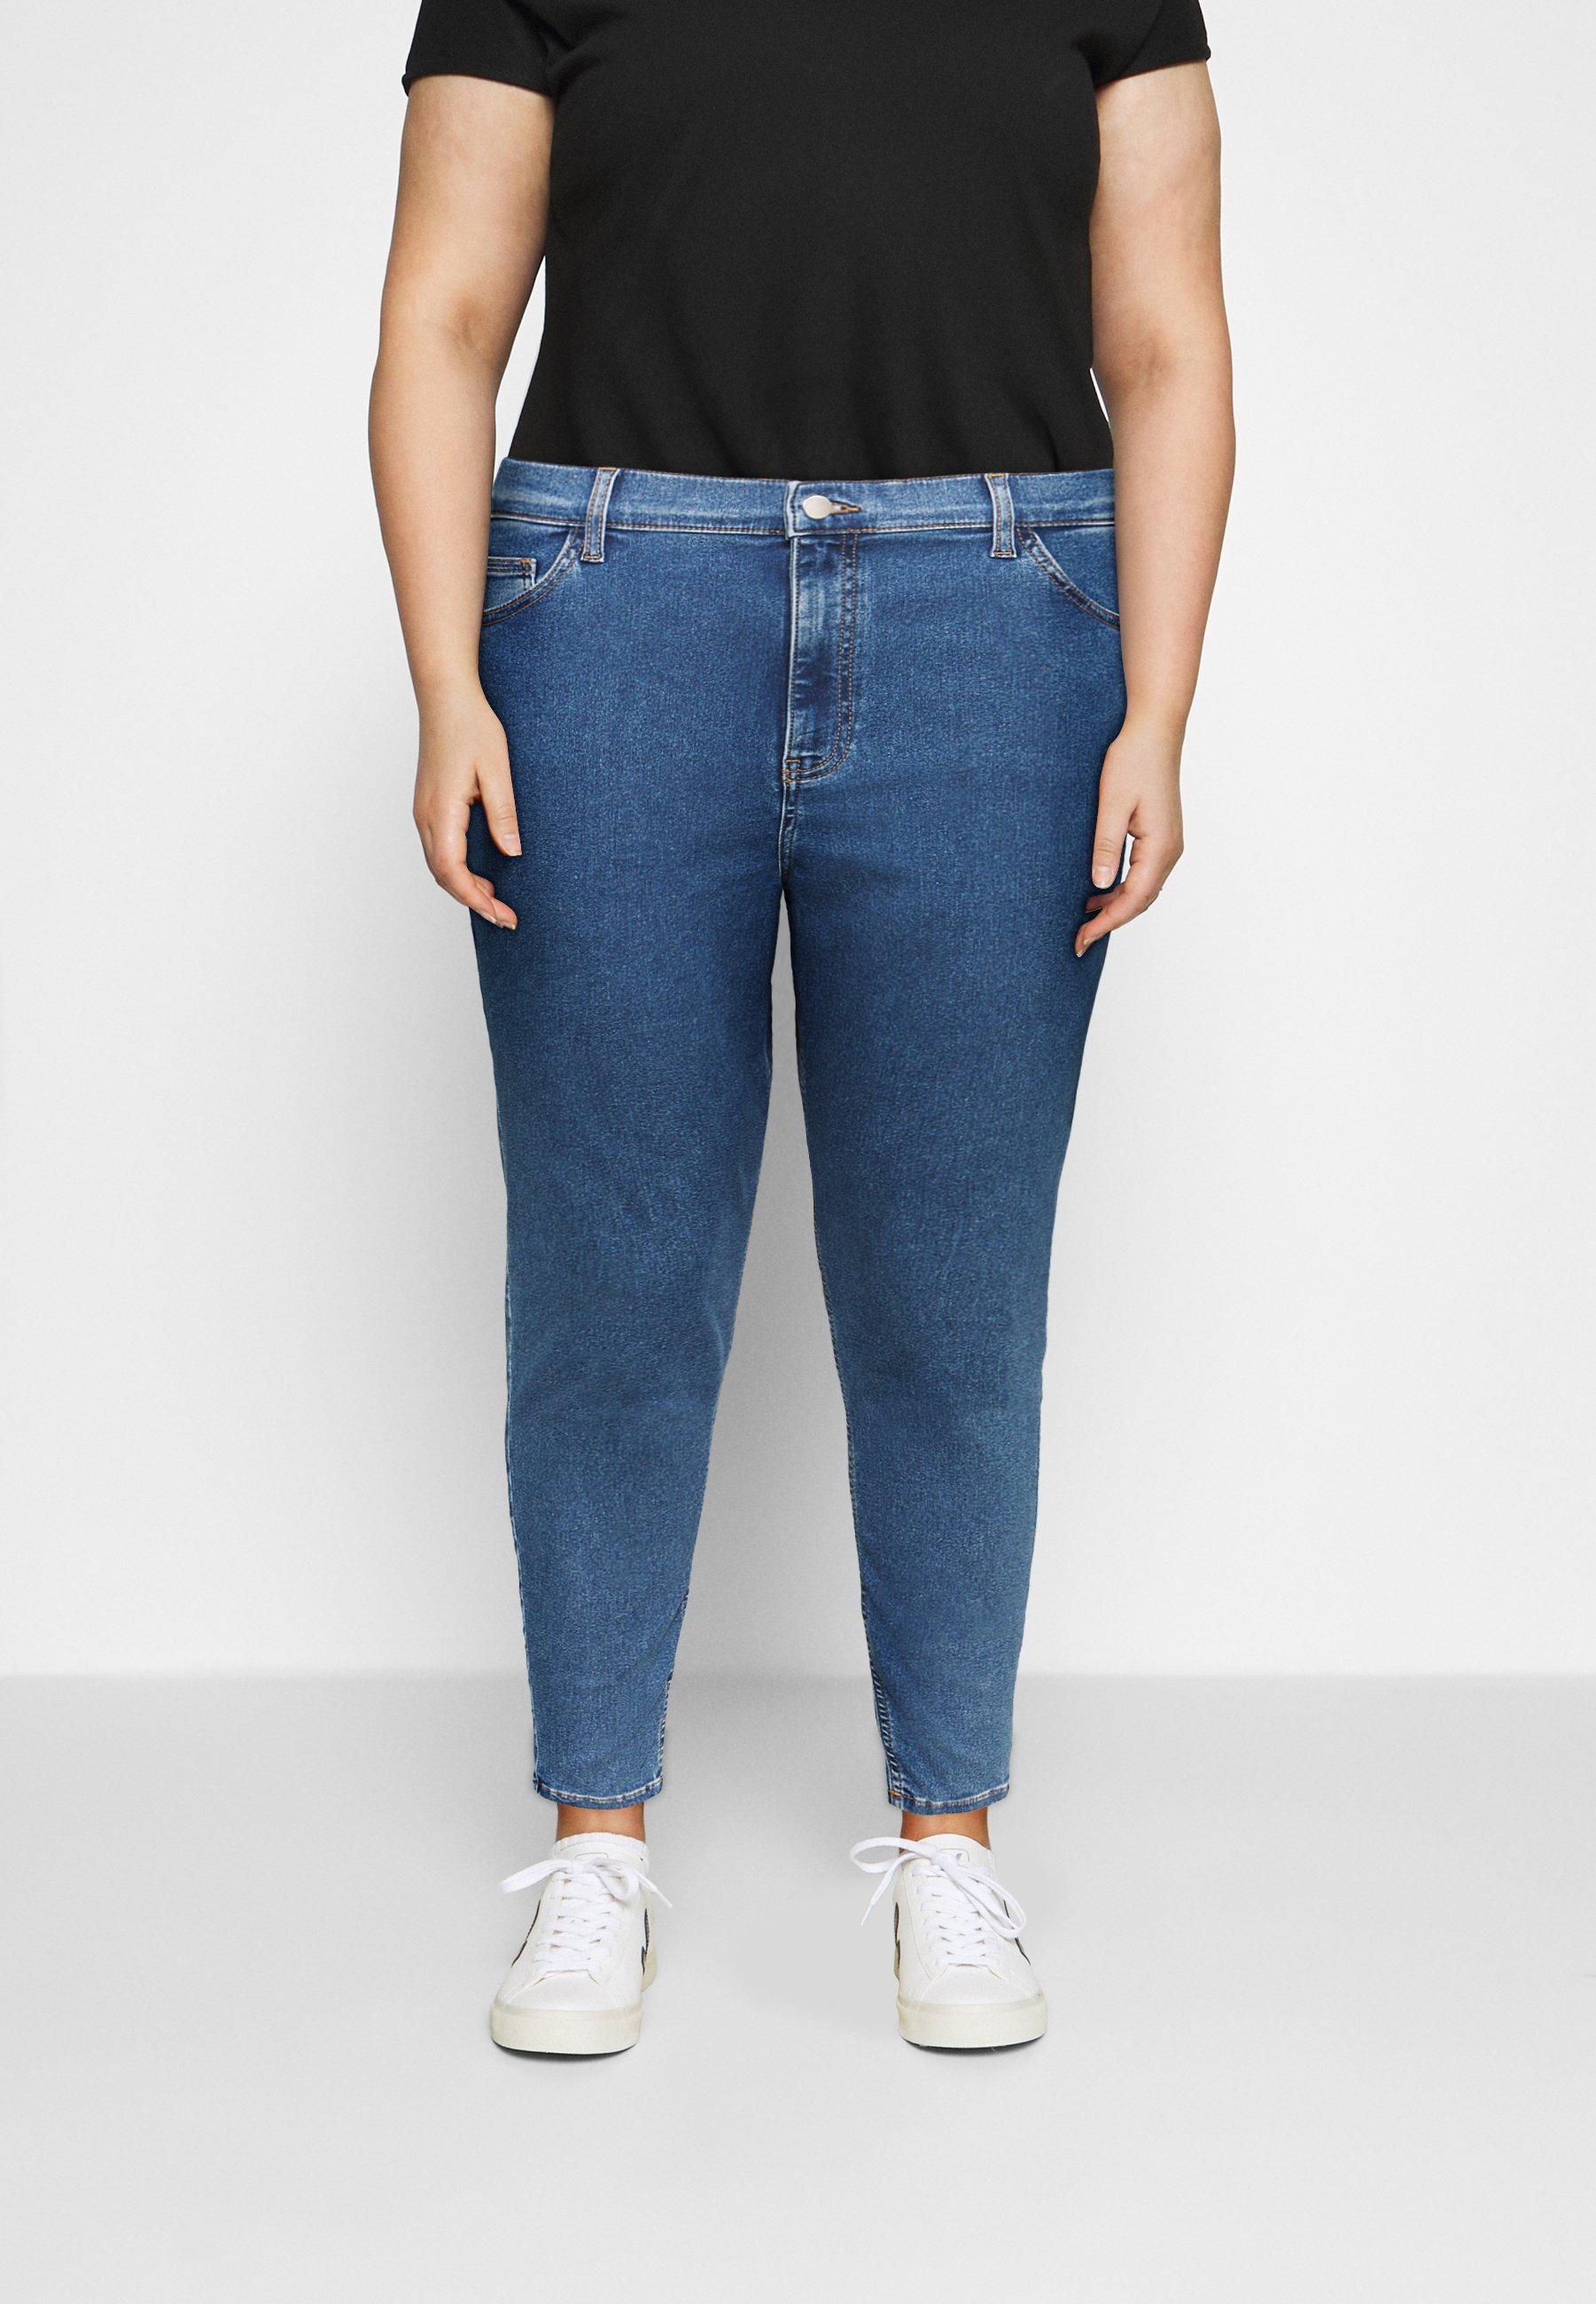 Femme Jeans Skinny